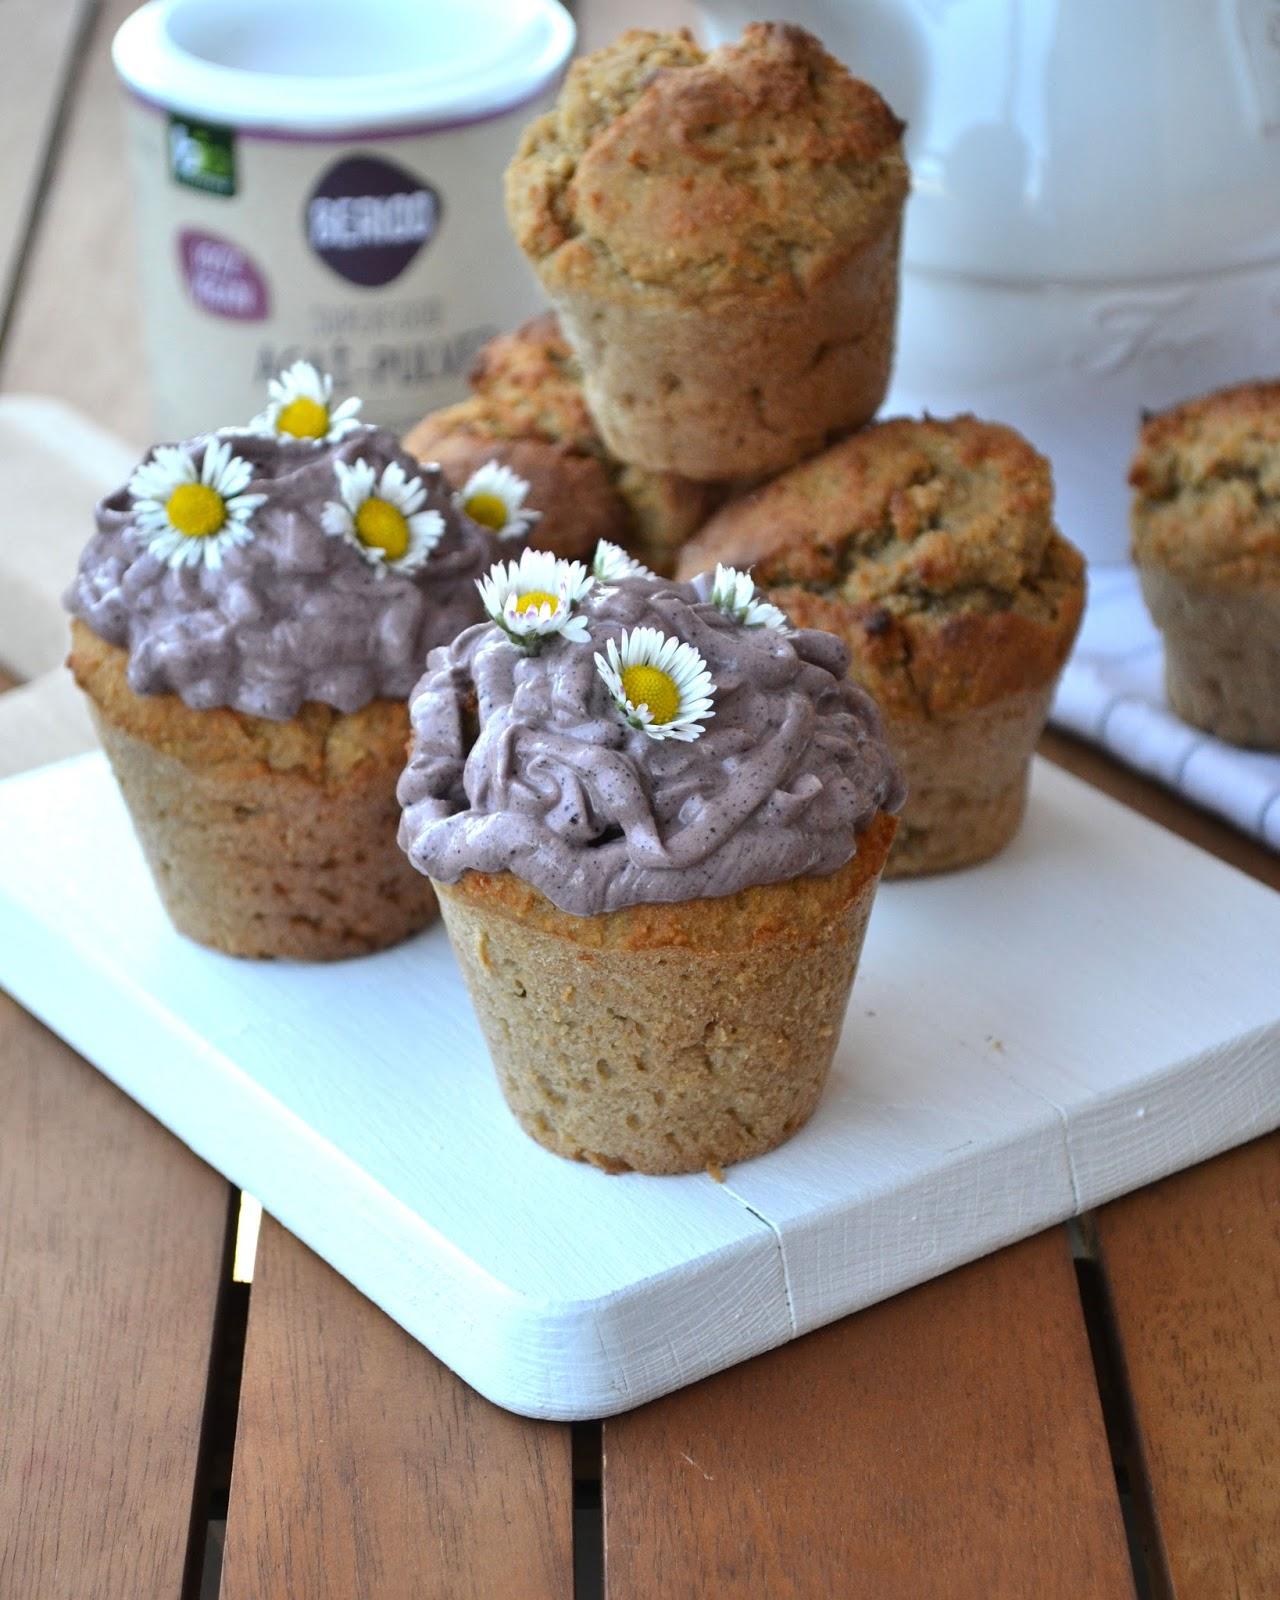 healthy eatspiration kokos muffins mal etwas anders. Black Bedroom Furniture Sets. Home Design Ideas